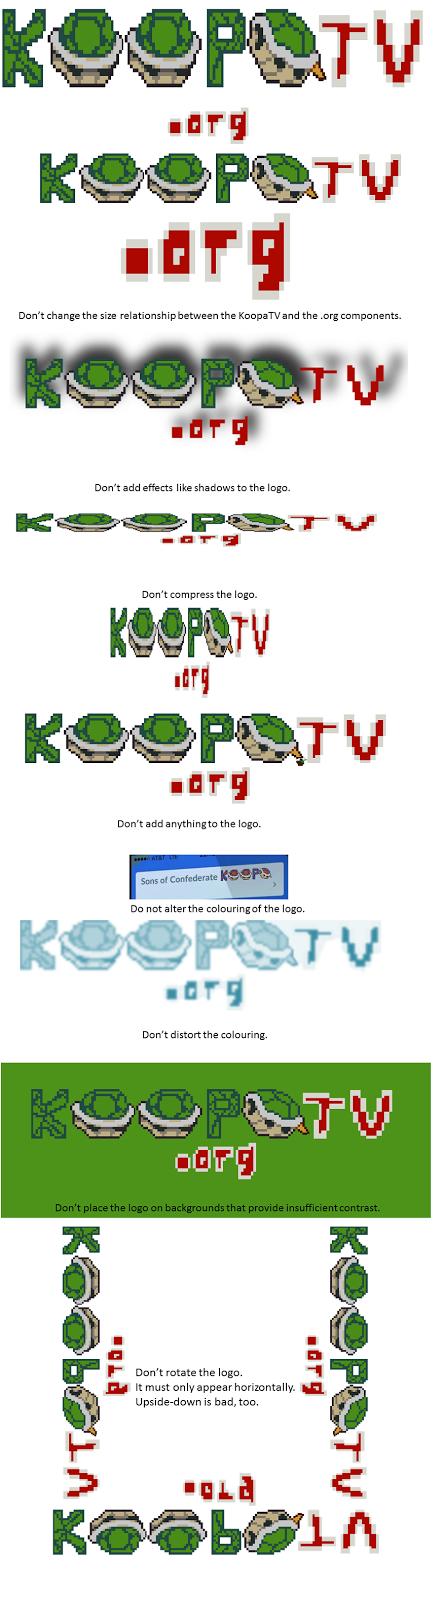 KoopaTV KoopaTV.org incorrect usage of logos examples